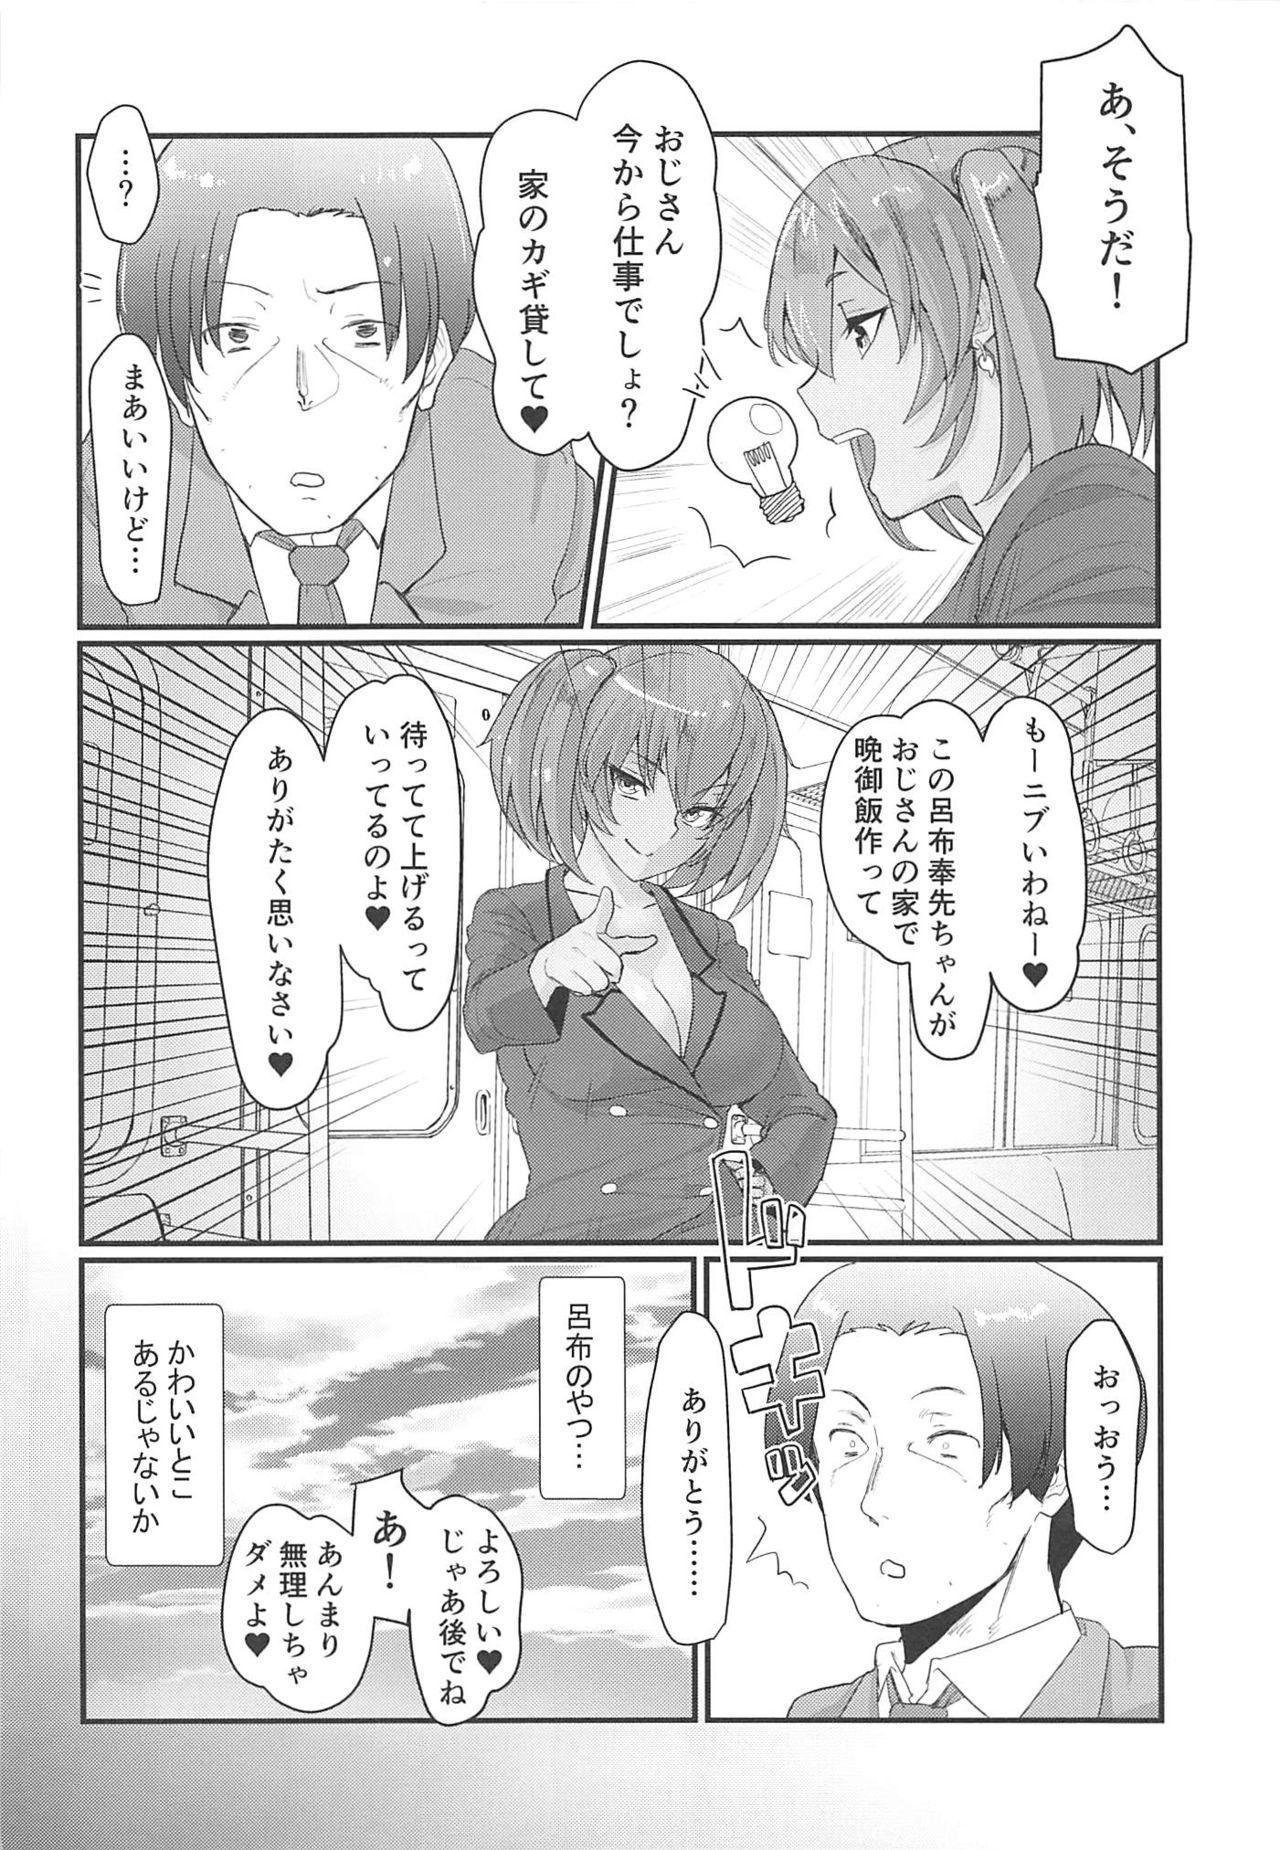 Ryofu Housen to Love Love Ofurox + Nurse Cos 4